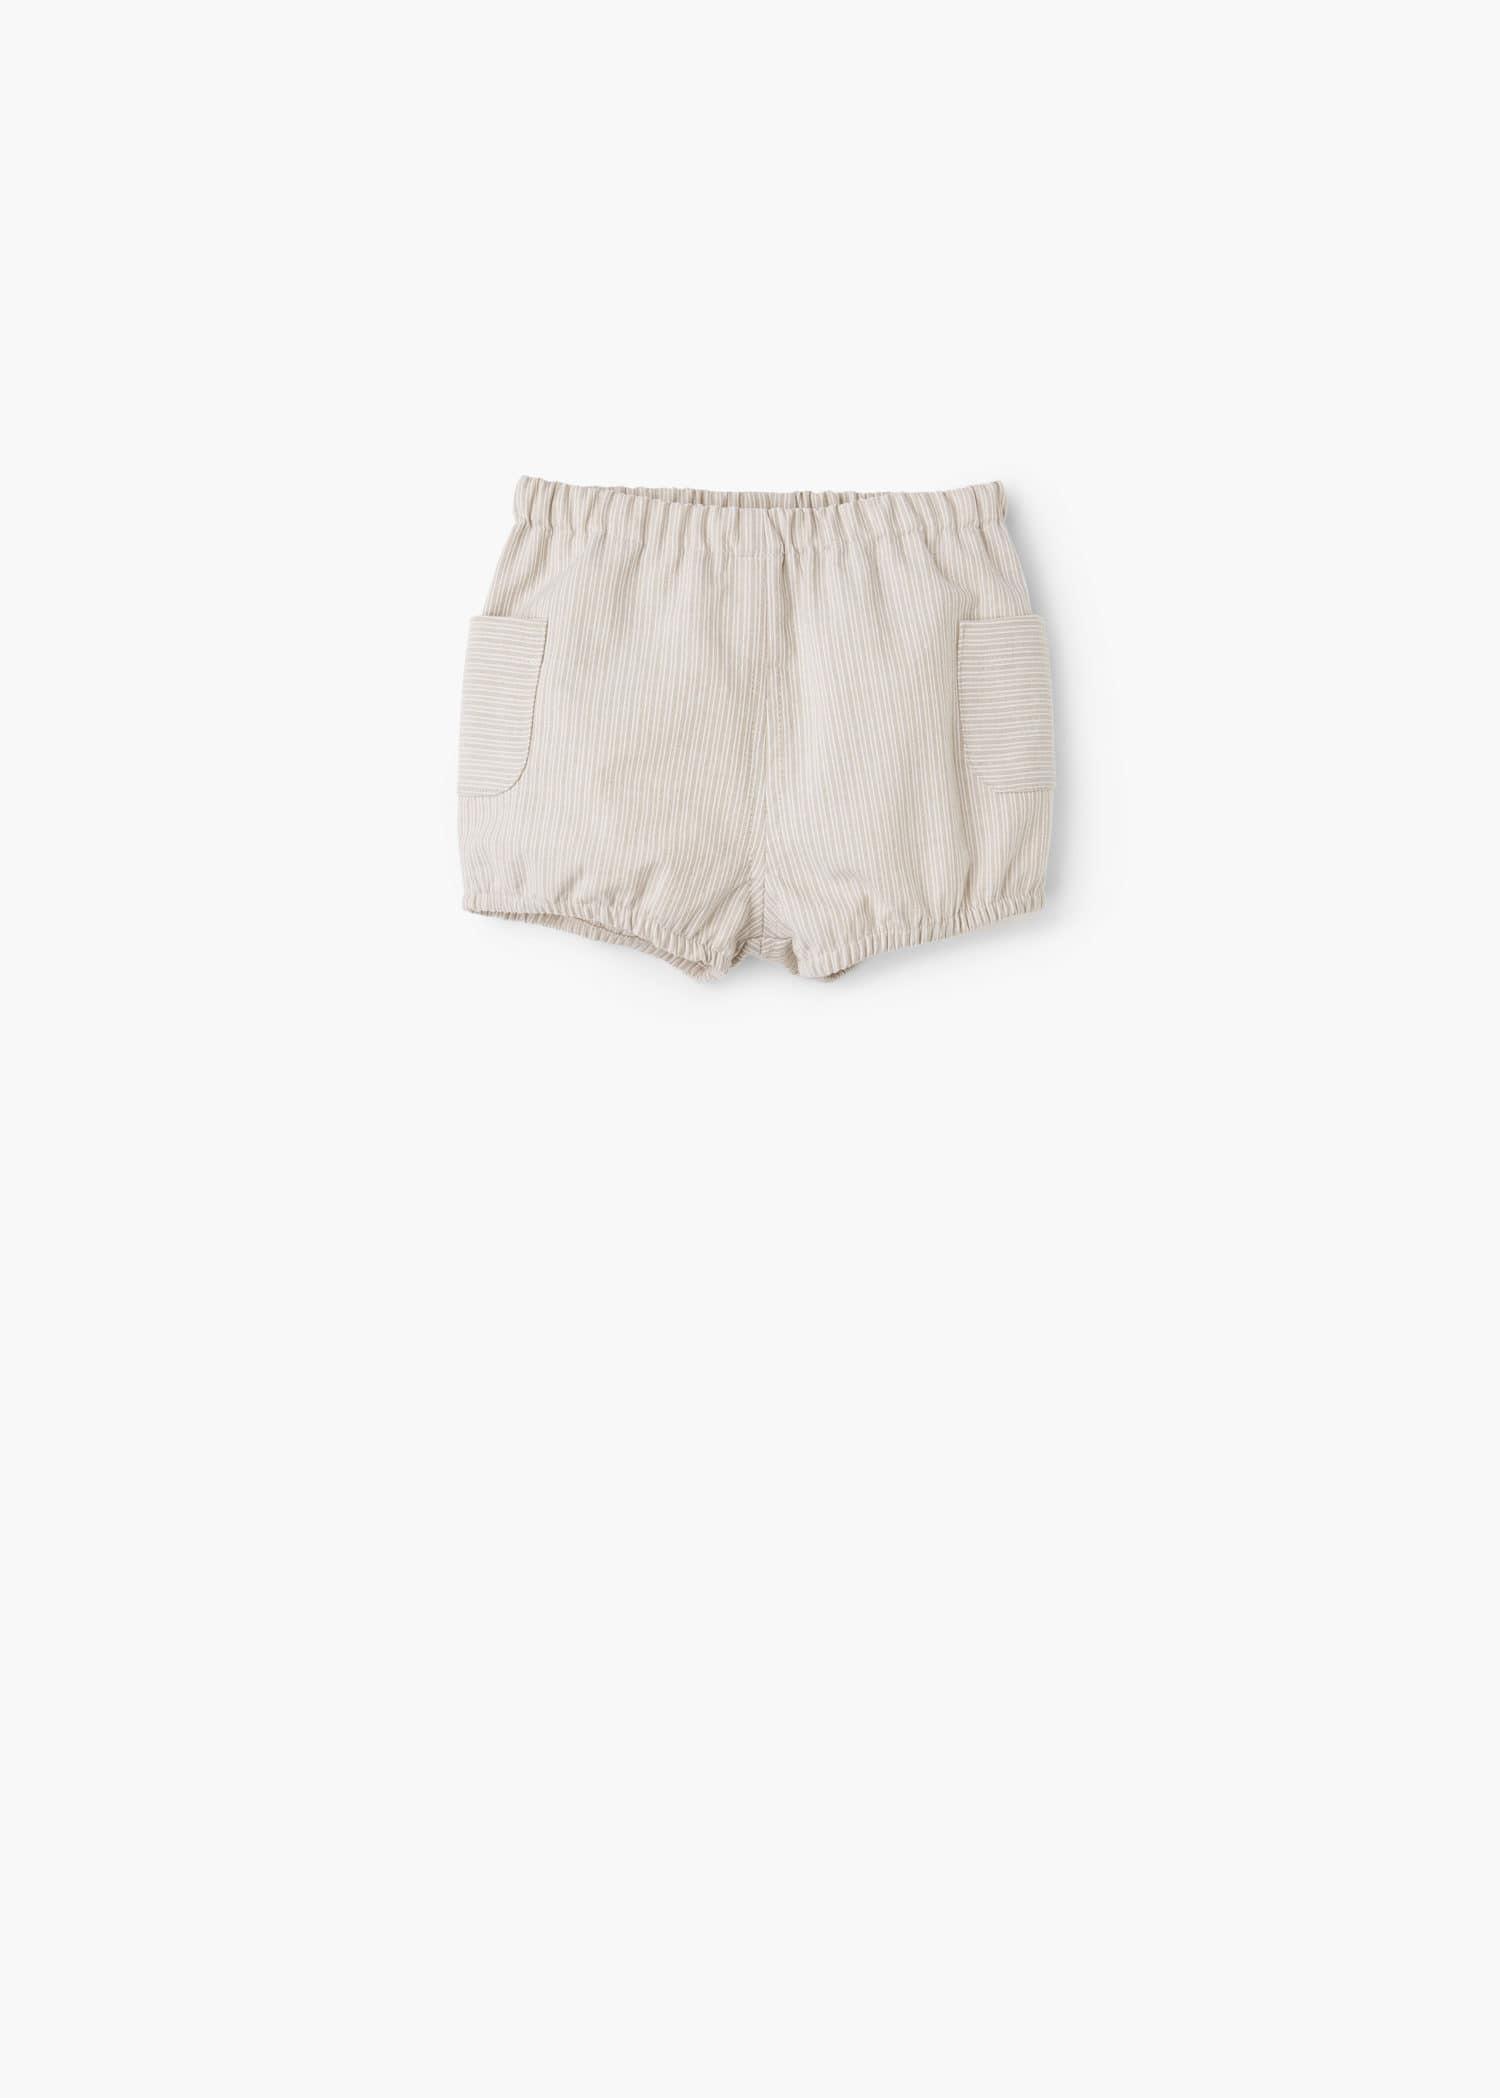 Cotton Cotton Cotton Bermuda Striped Shorts Striped Striped Shorts Bermuda 0w8PnkO